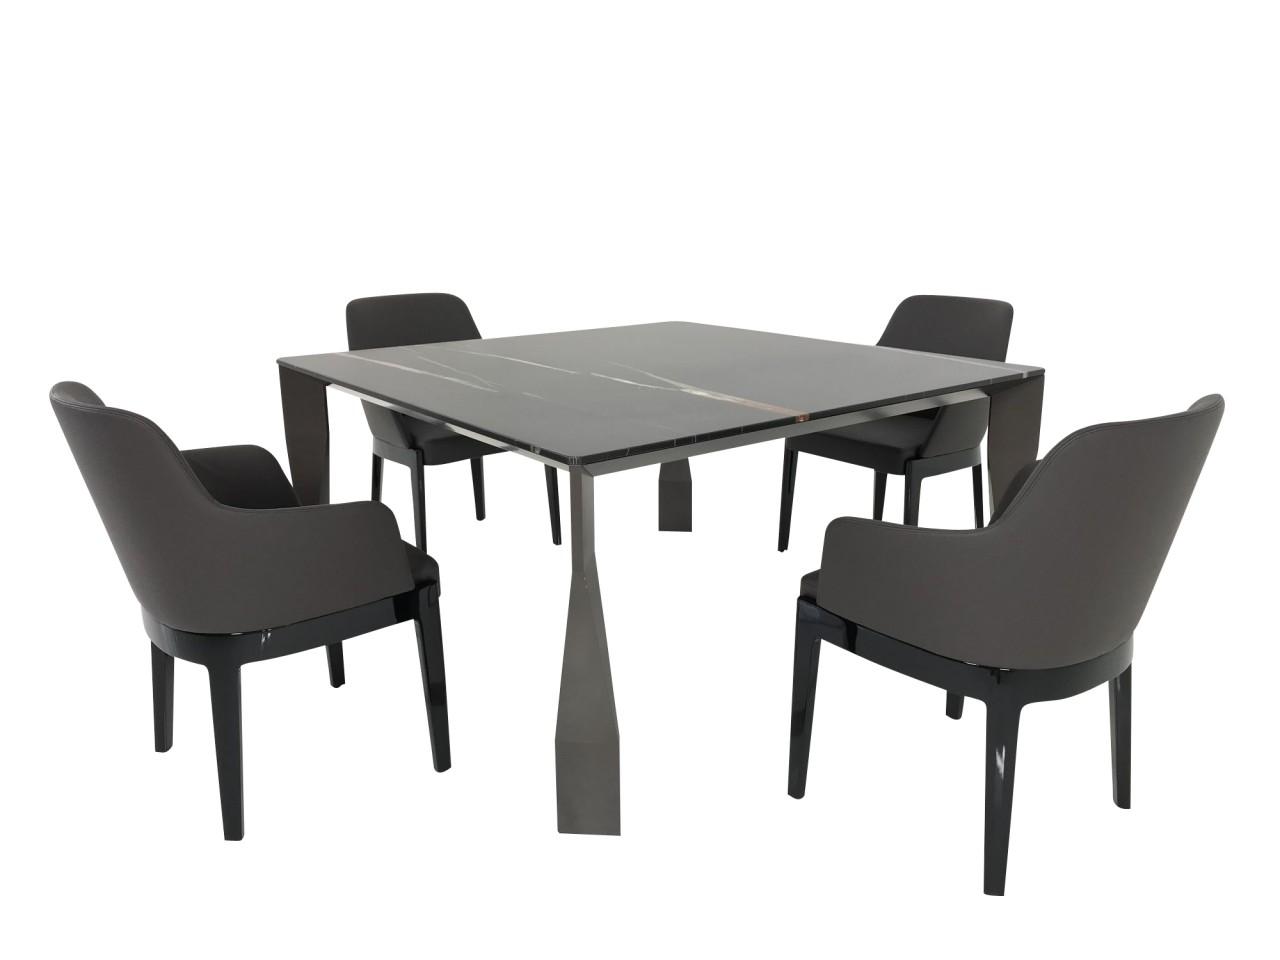 Molteni & C. DIAMOND Tisch Marmor Sahara Noir mit CHELSEA Stühlen in Leder dunkelbraun